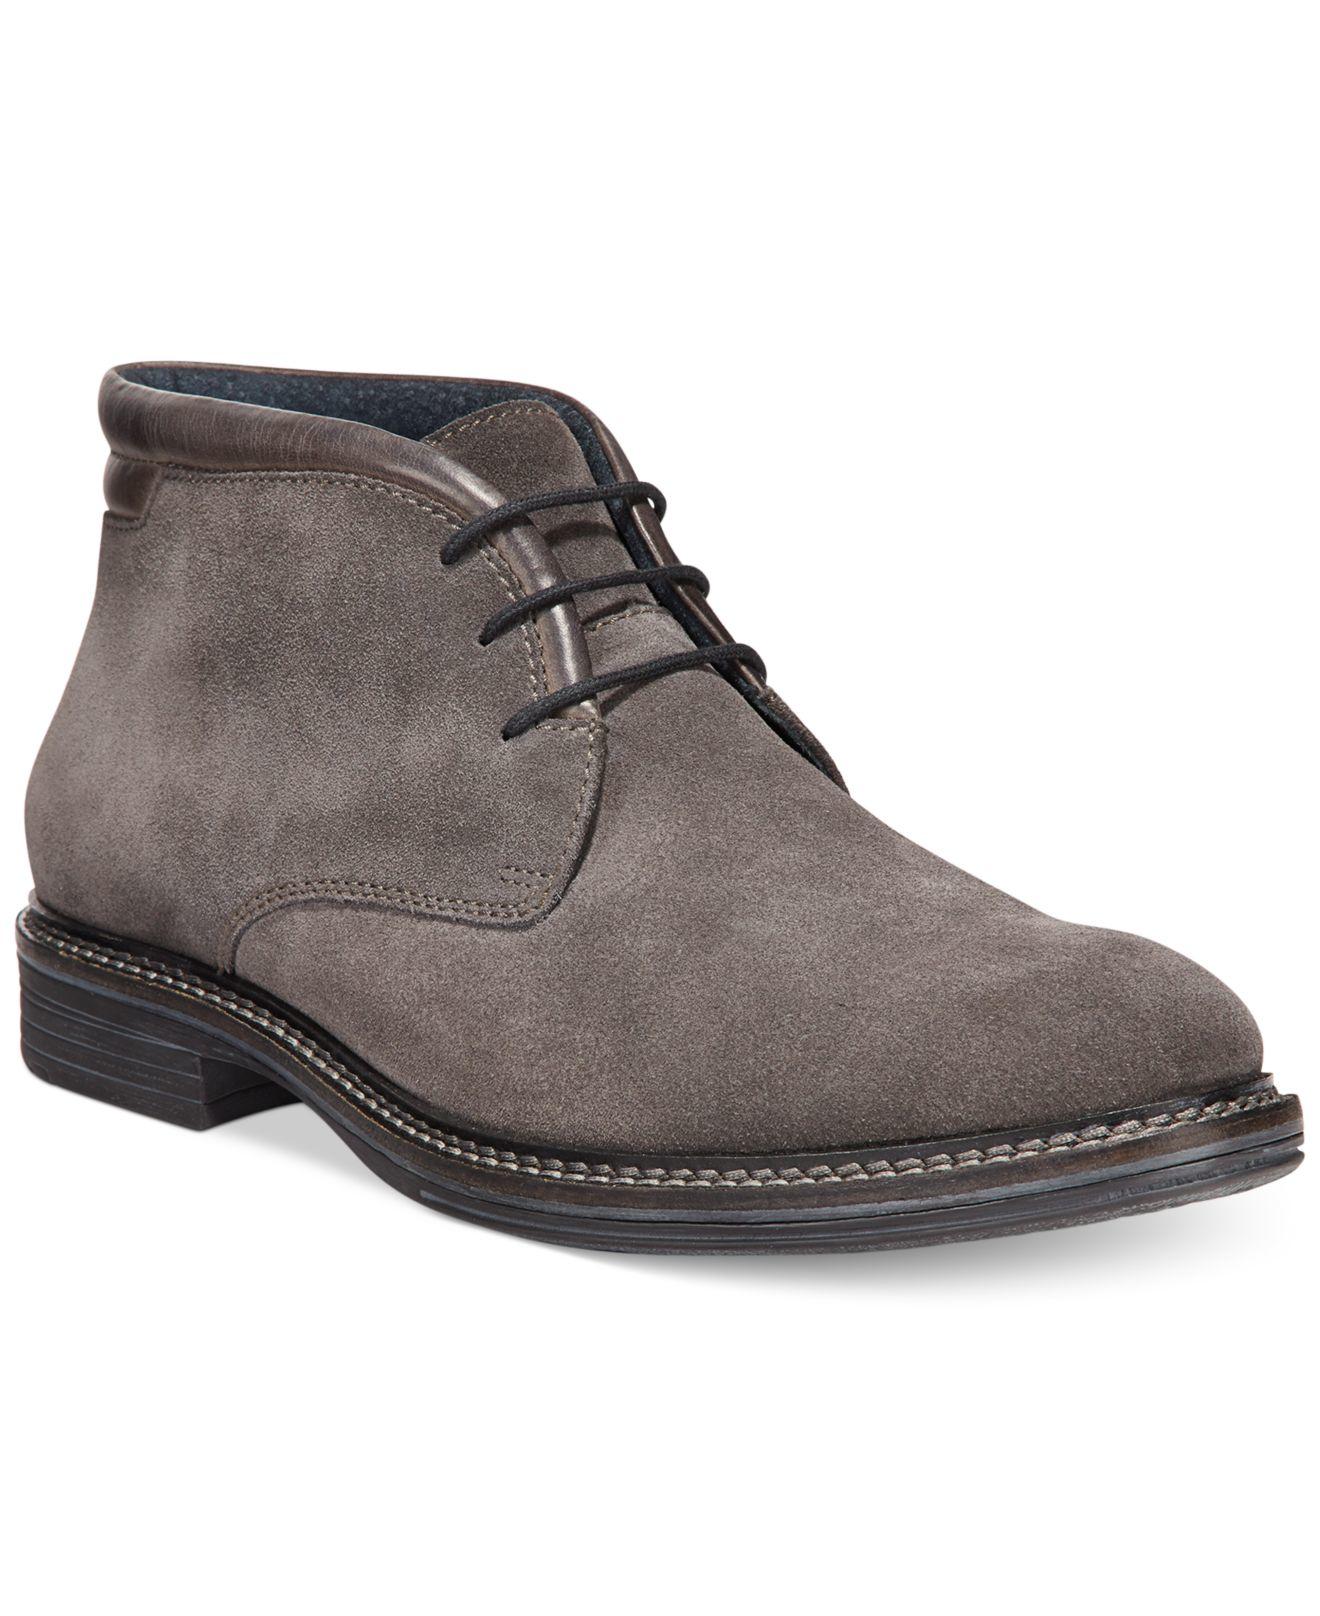 Suede Mens Shoes Macys